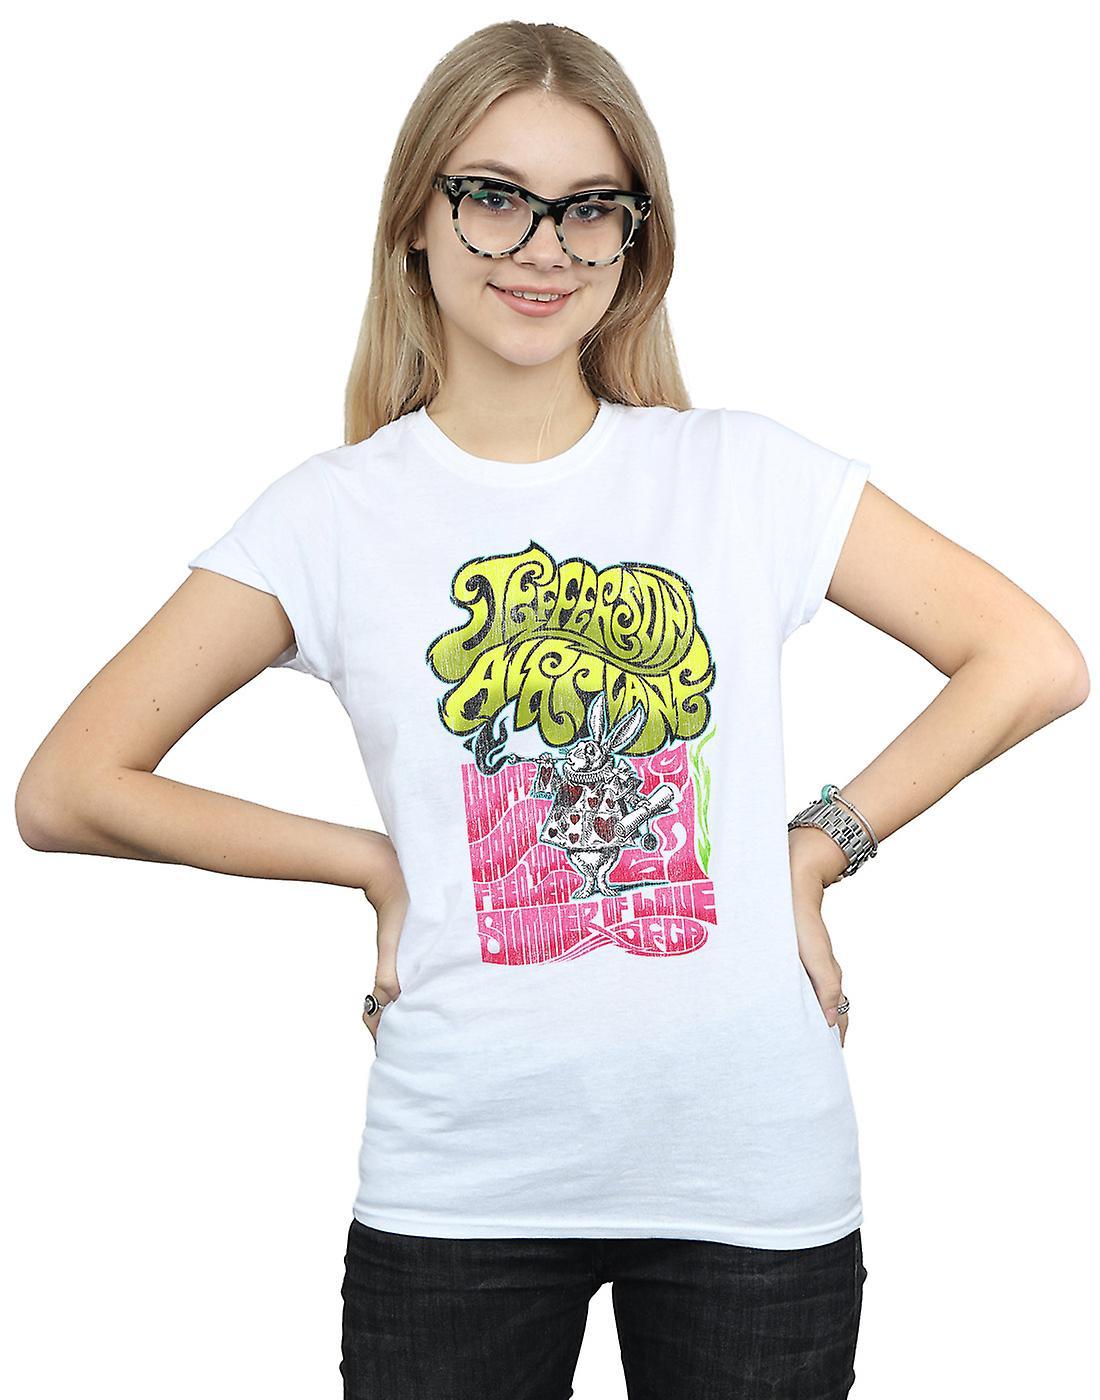 Jefferson Airplane Women's Summer Of Love T-Shirt